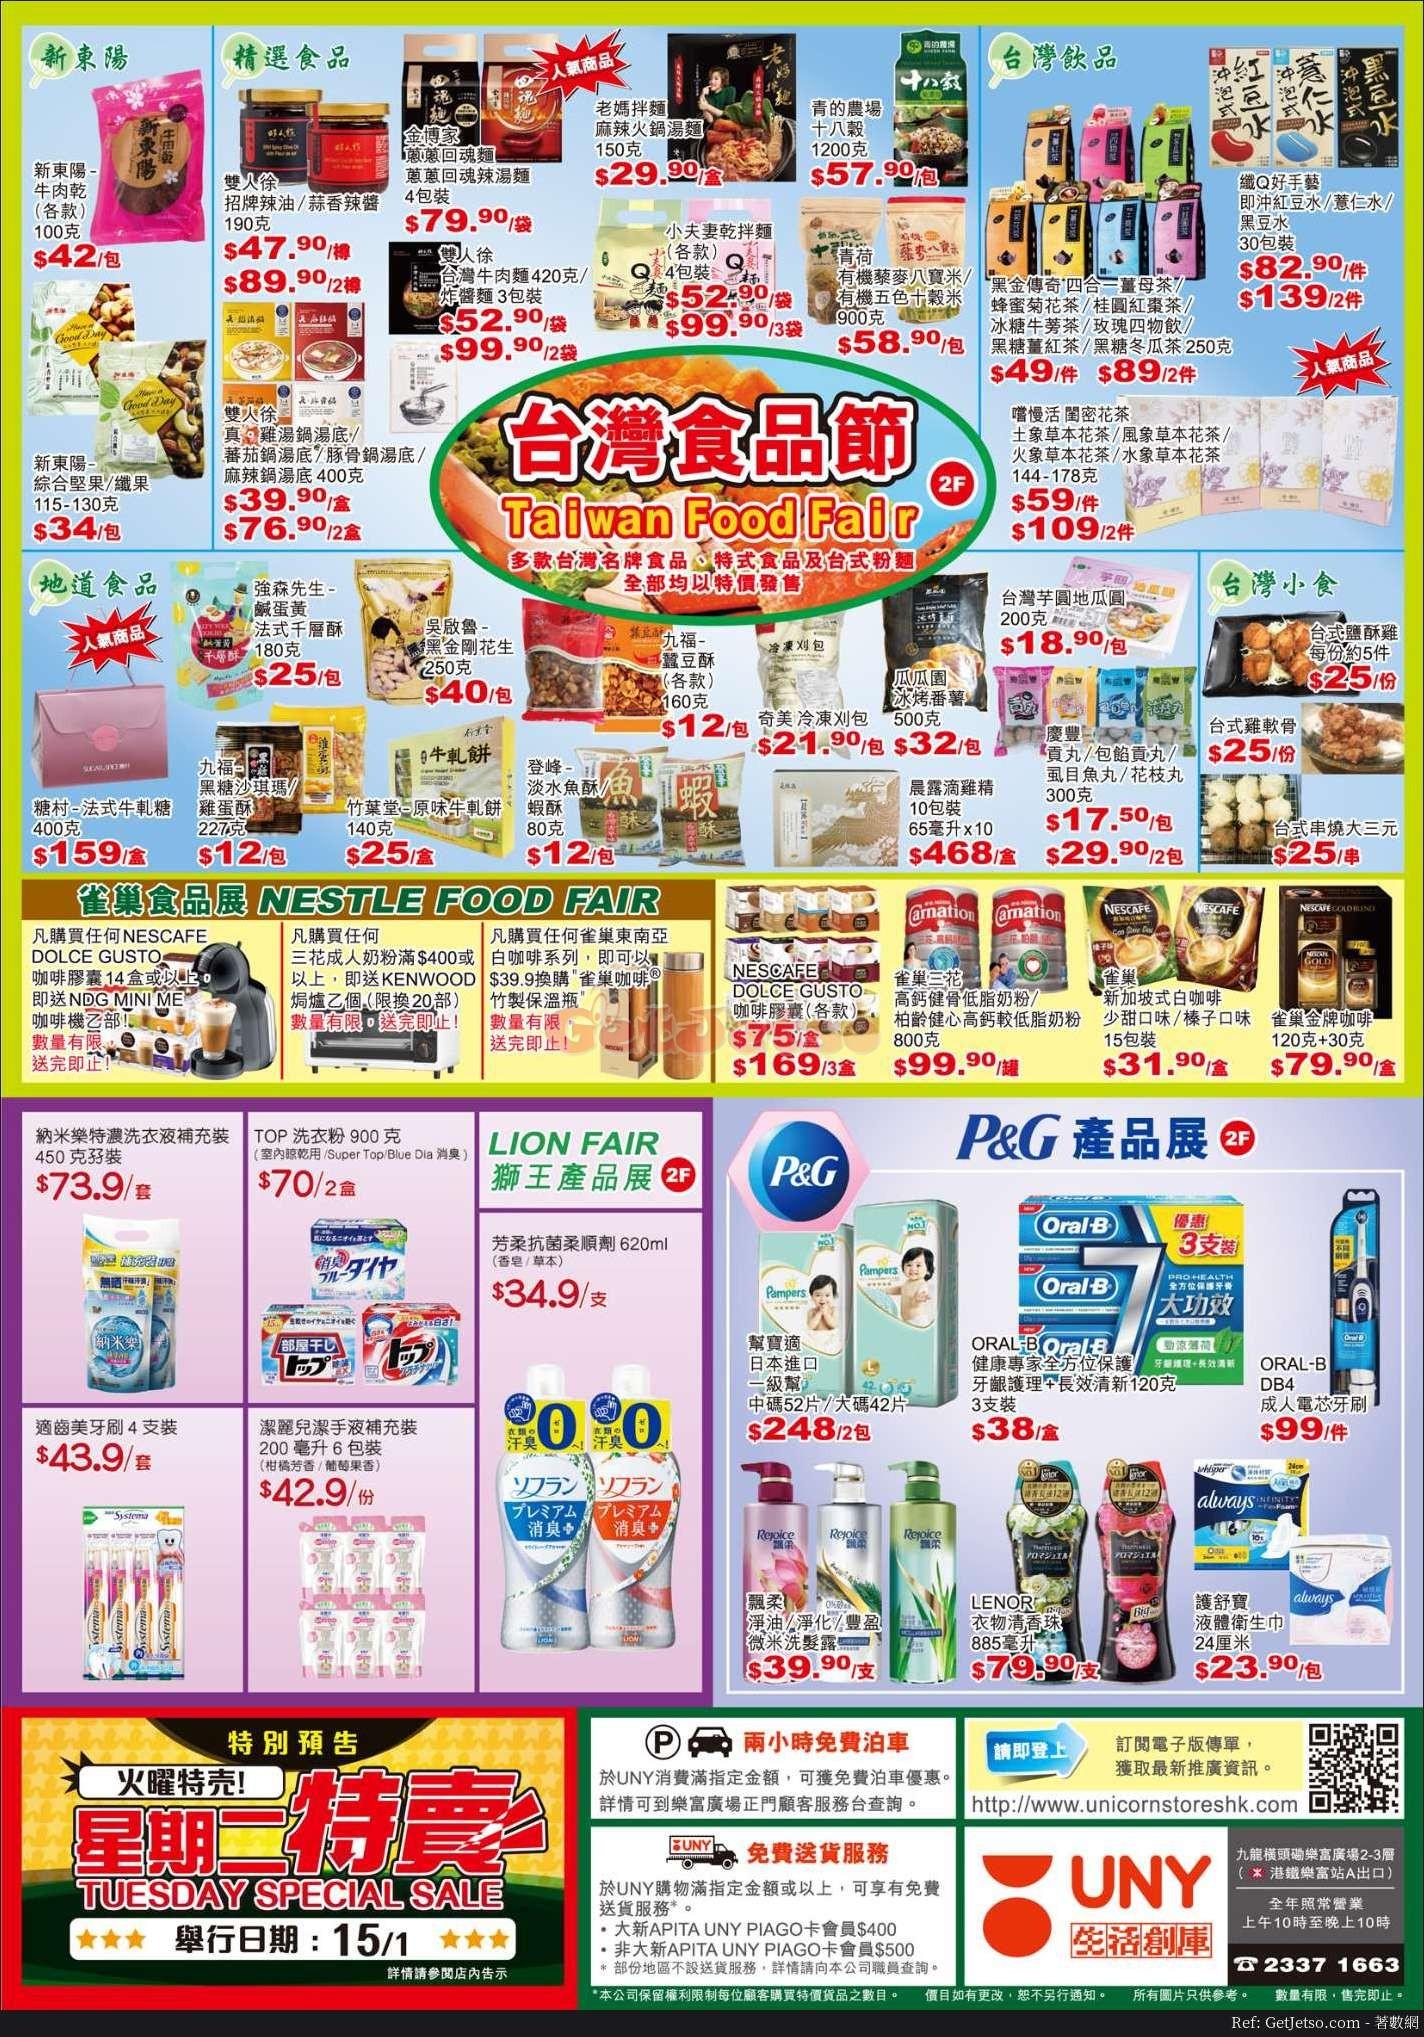 UNY、APITA、PIAGO 最新購物優惠(1月10日更新)